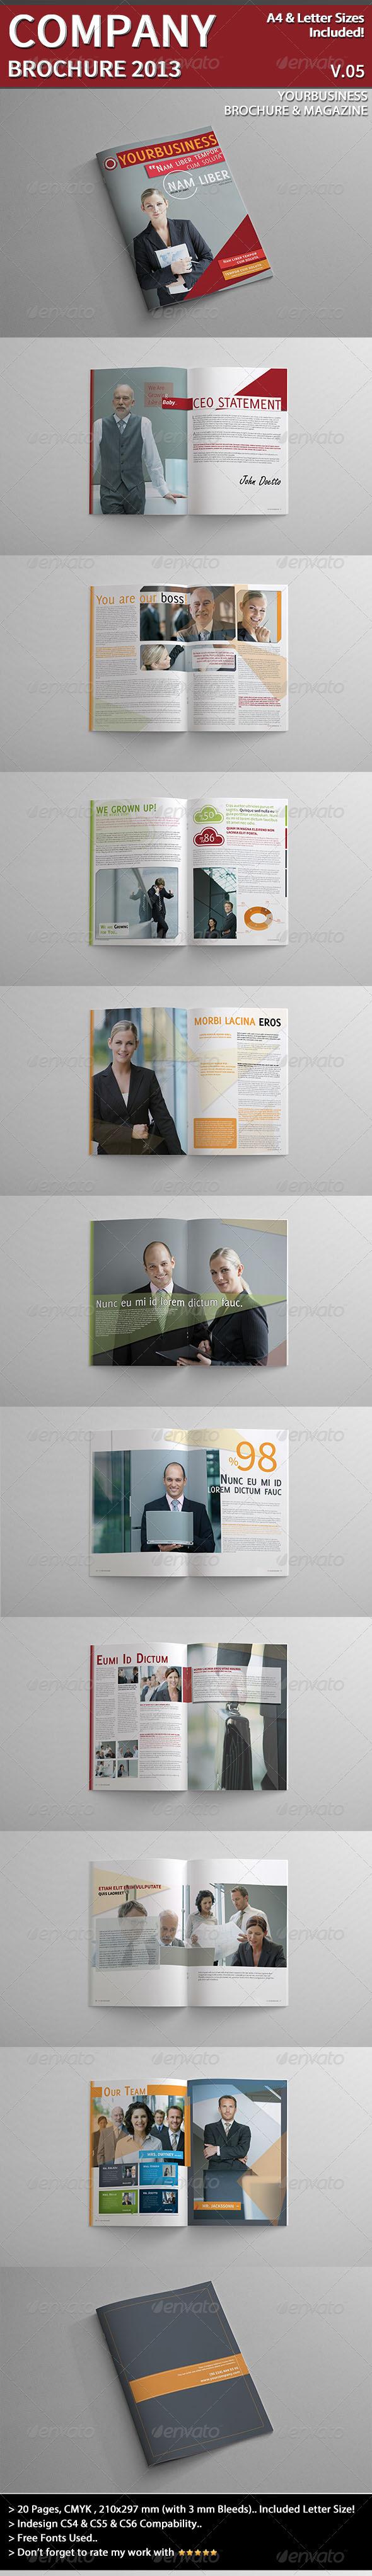 Company Brochure 2013 Part 05 - Corporate Brochures